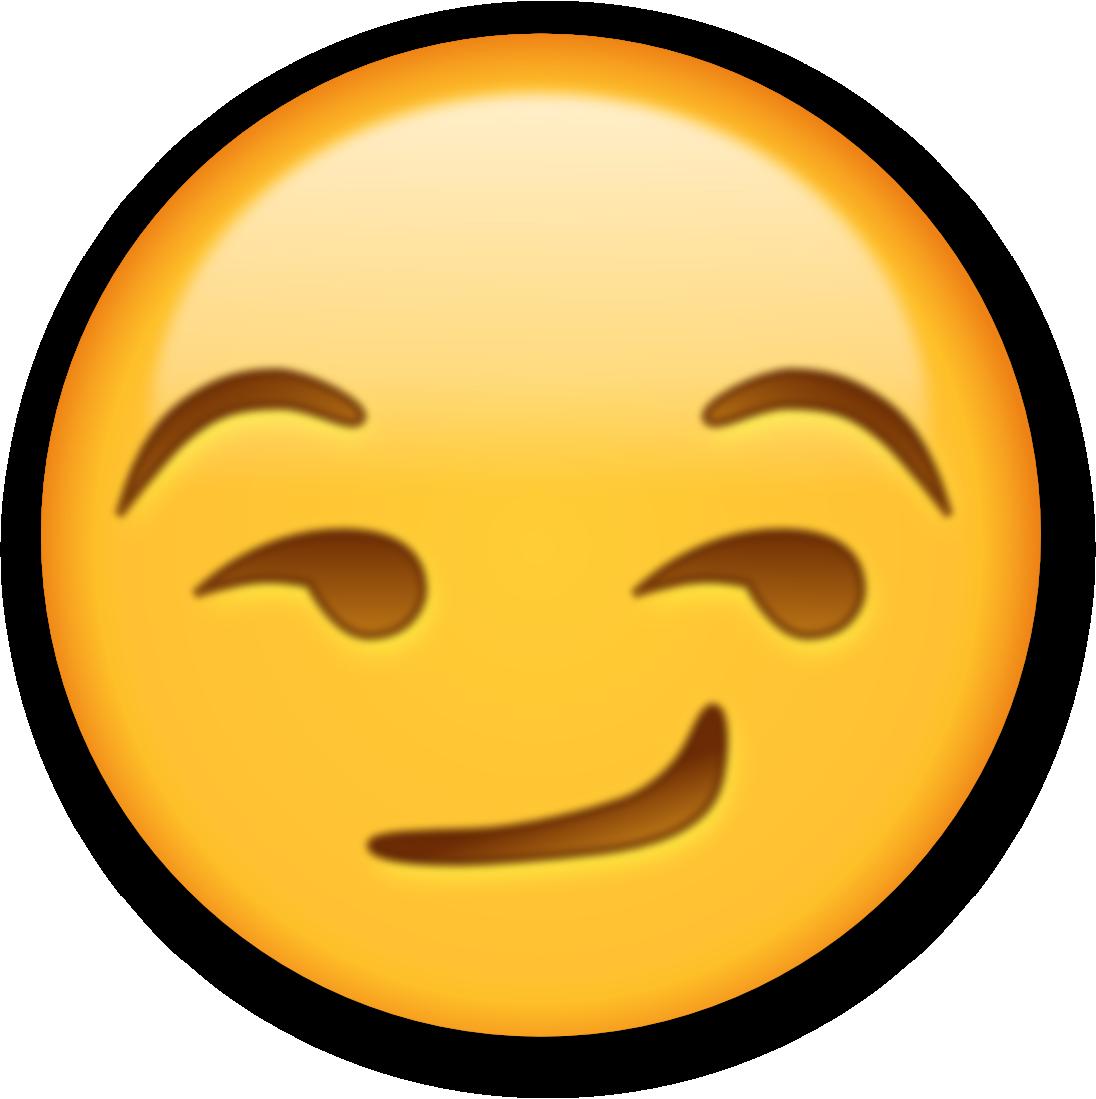 tumblr emoji transparent - photo #46